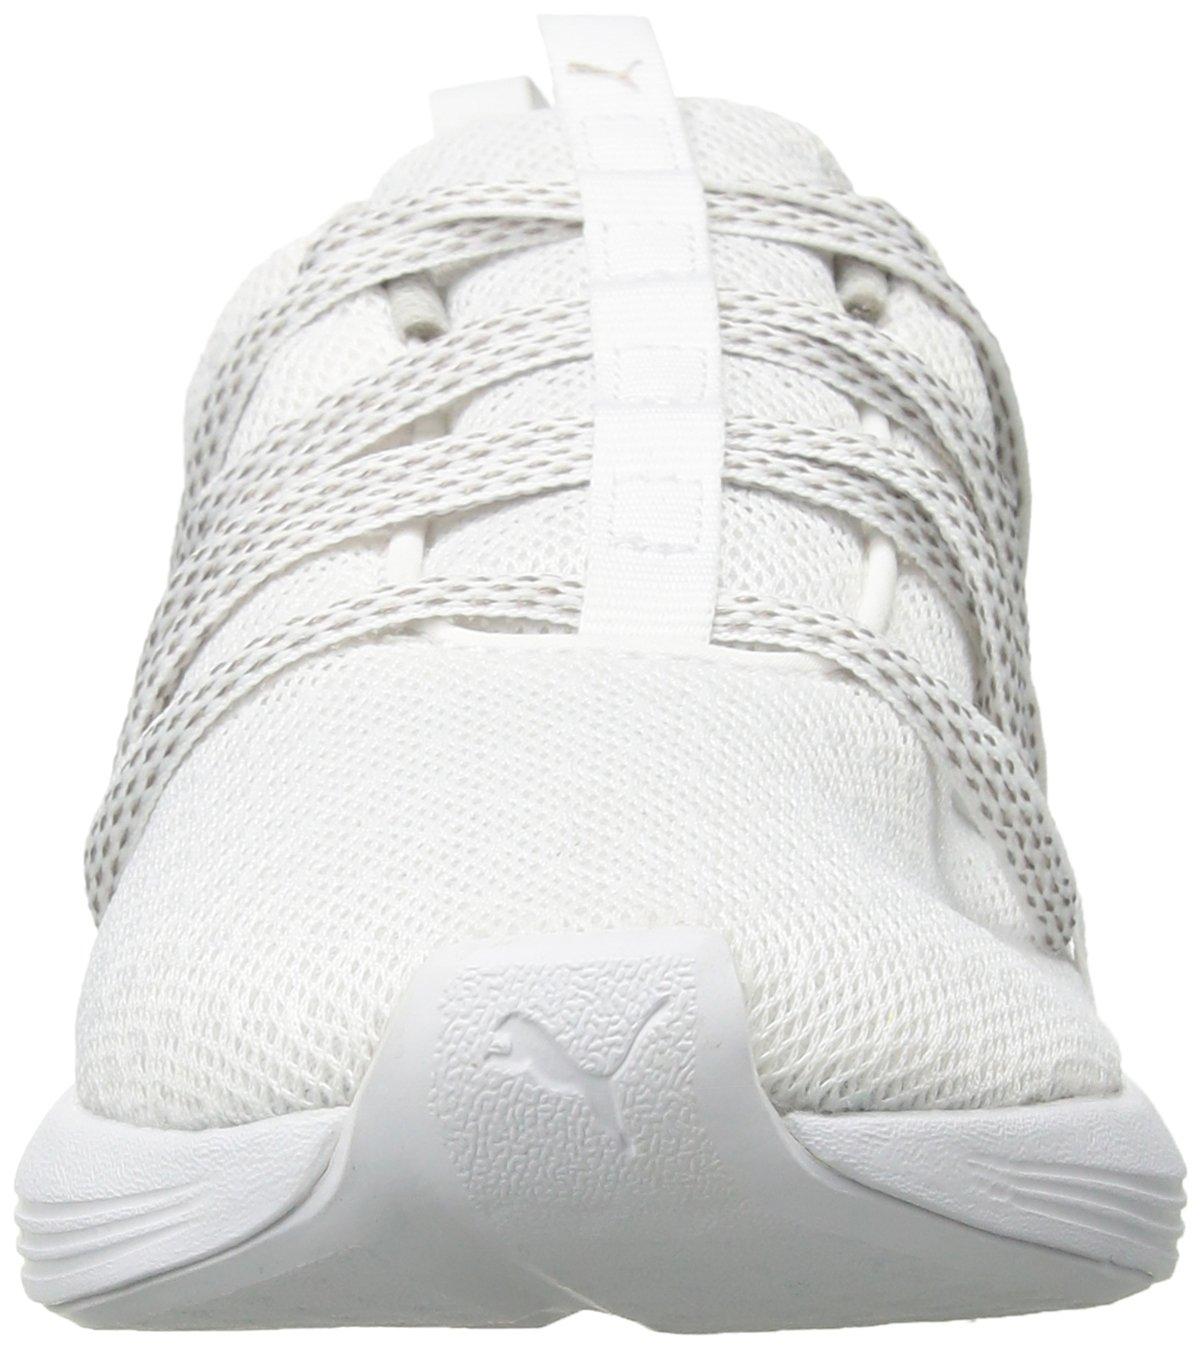 PUMA Women's Prowl Alt B07569NY3S Knit Mesh Wn Sneaker B07569NY3S Alt 6 B(M) US|Puma White-metallic Beige 6907e2